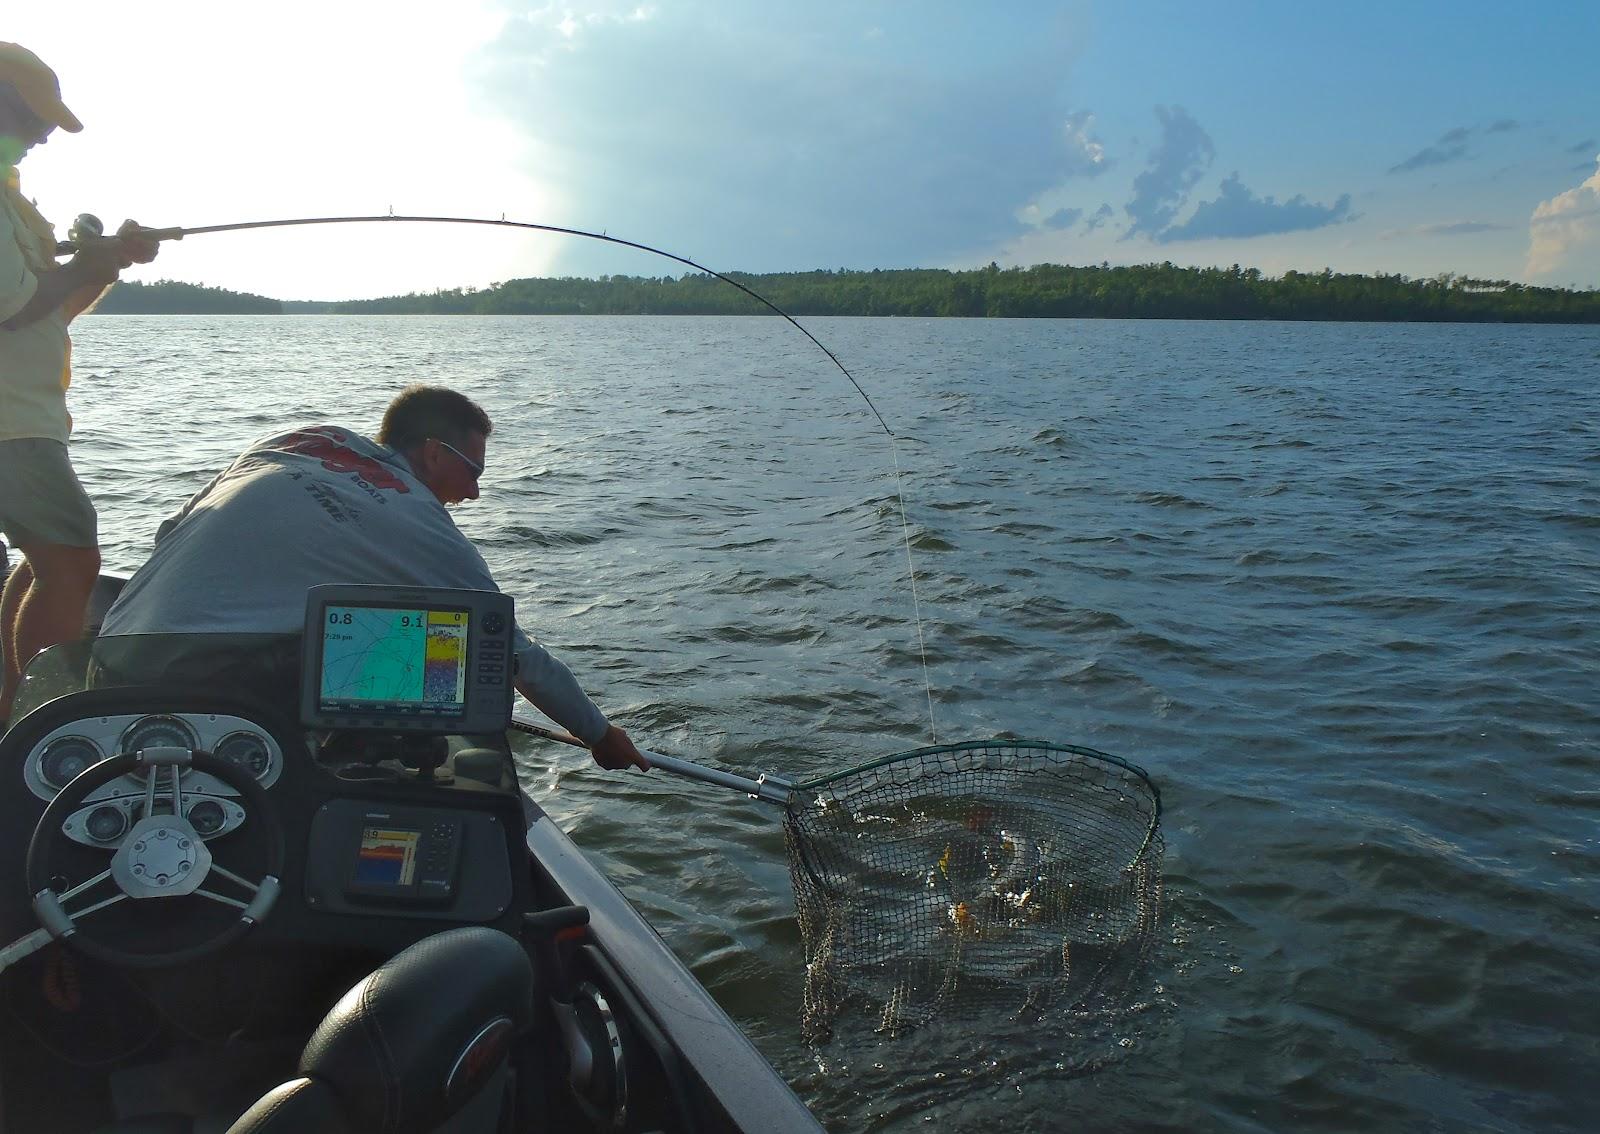 Lake vermilion fishing report 2011 for Lake vermilion fishing reports